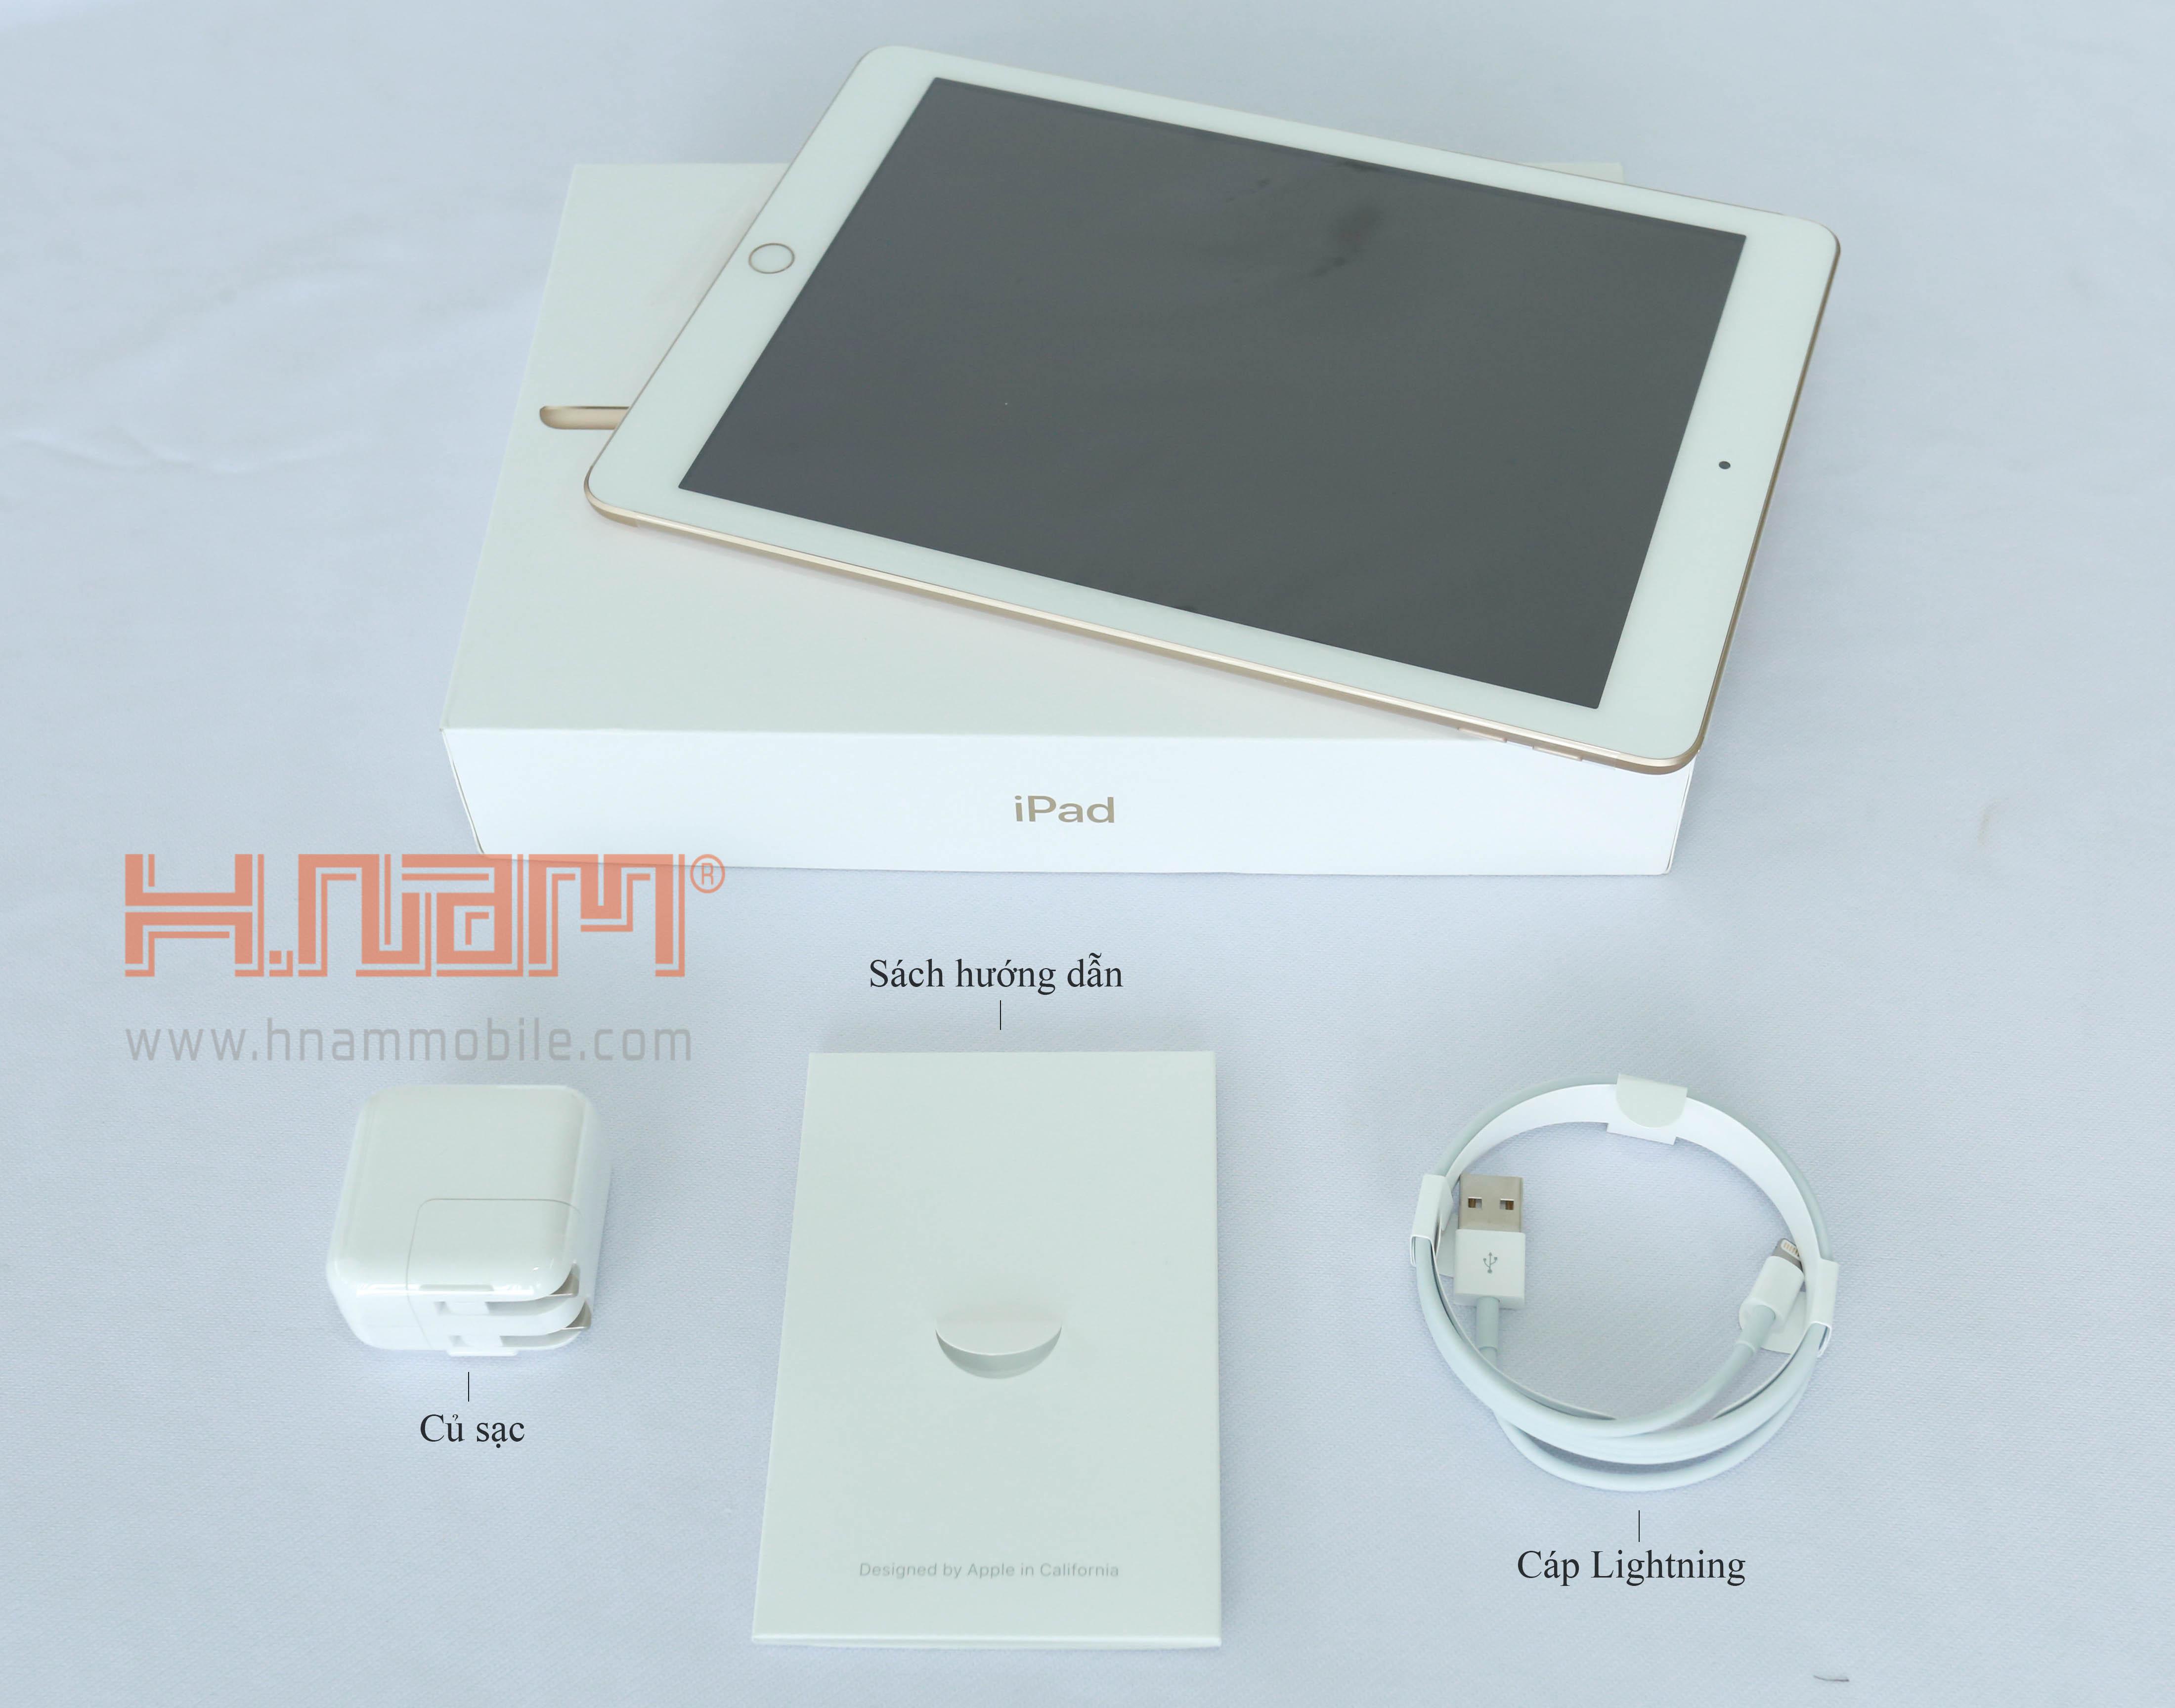 Apple iPad Gen 5 (2017) Cellular 32Gb hình sản phẩm 0